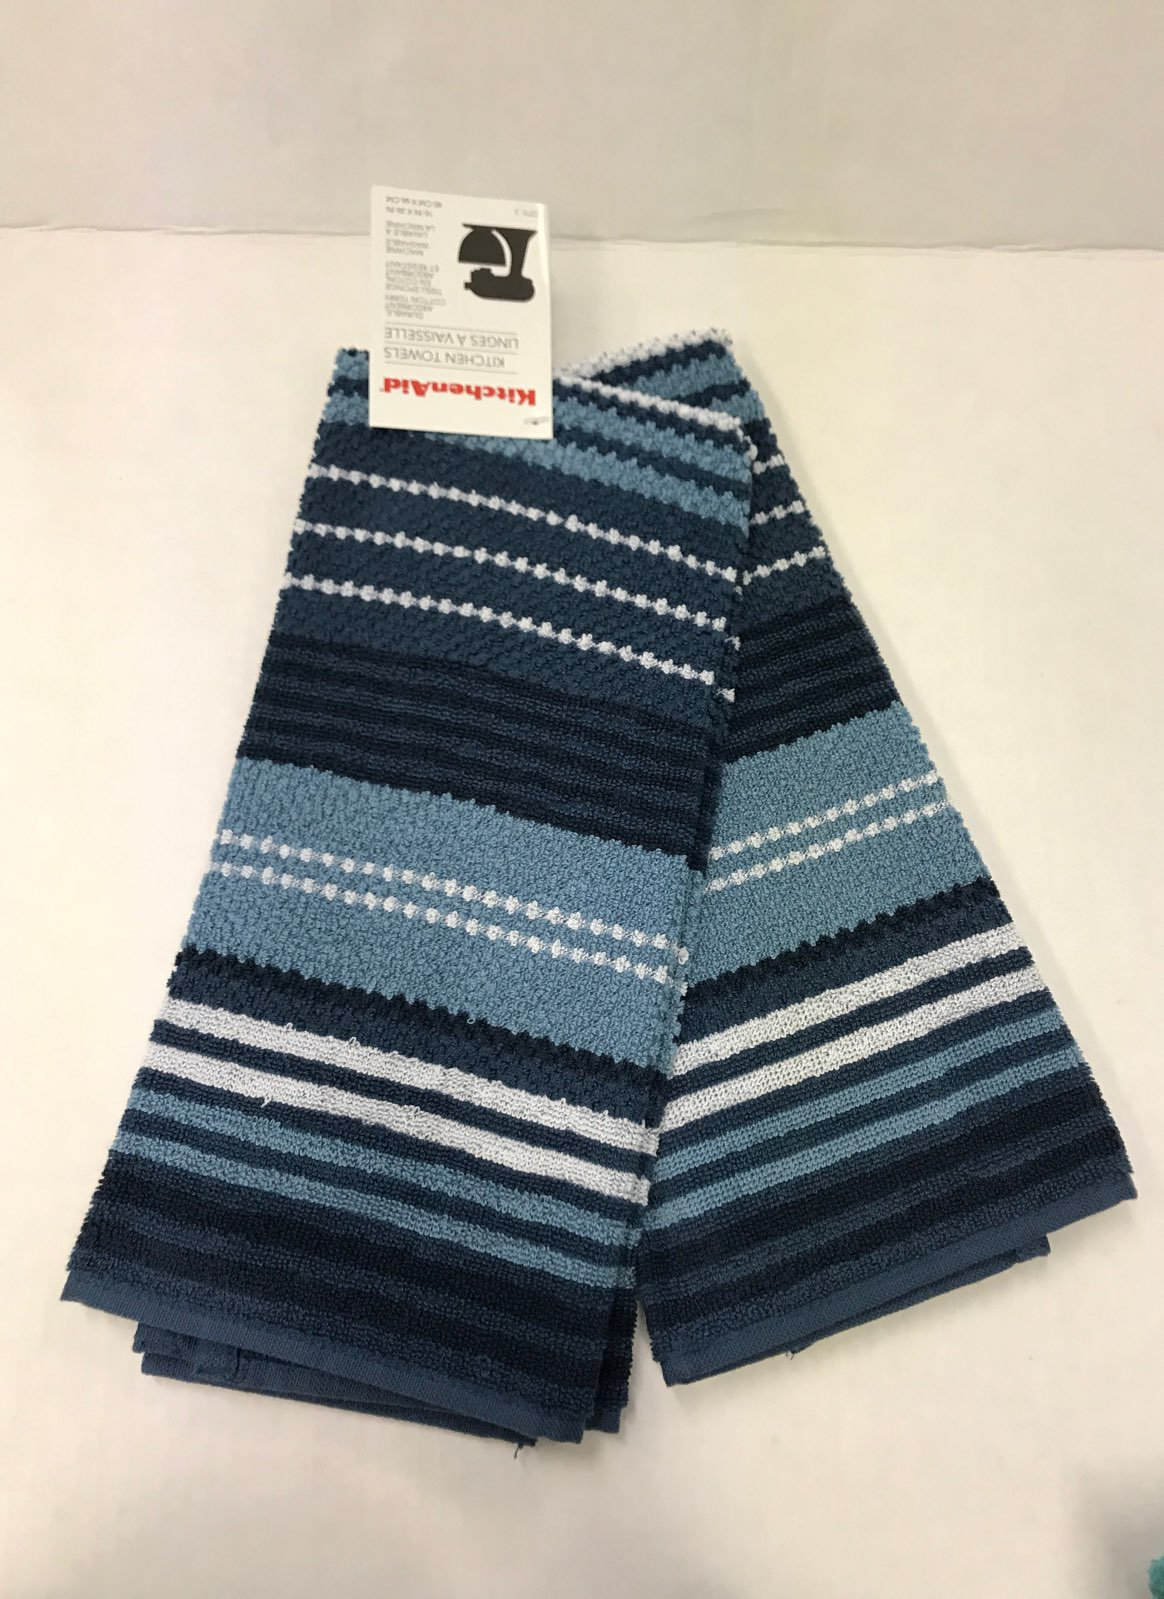 Kitchenaid Blue Willow Kitchen Towel Set